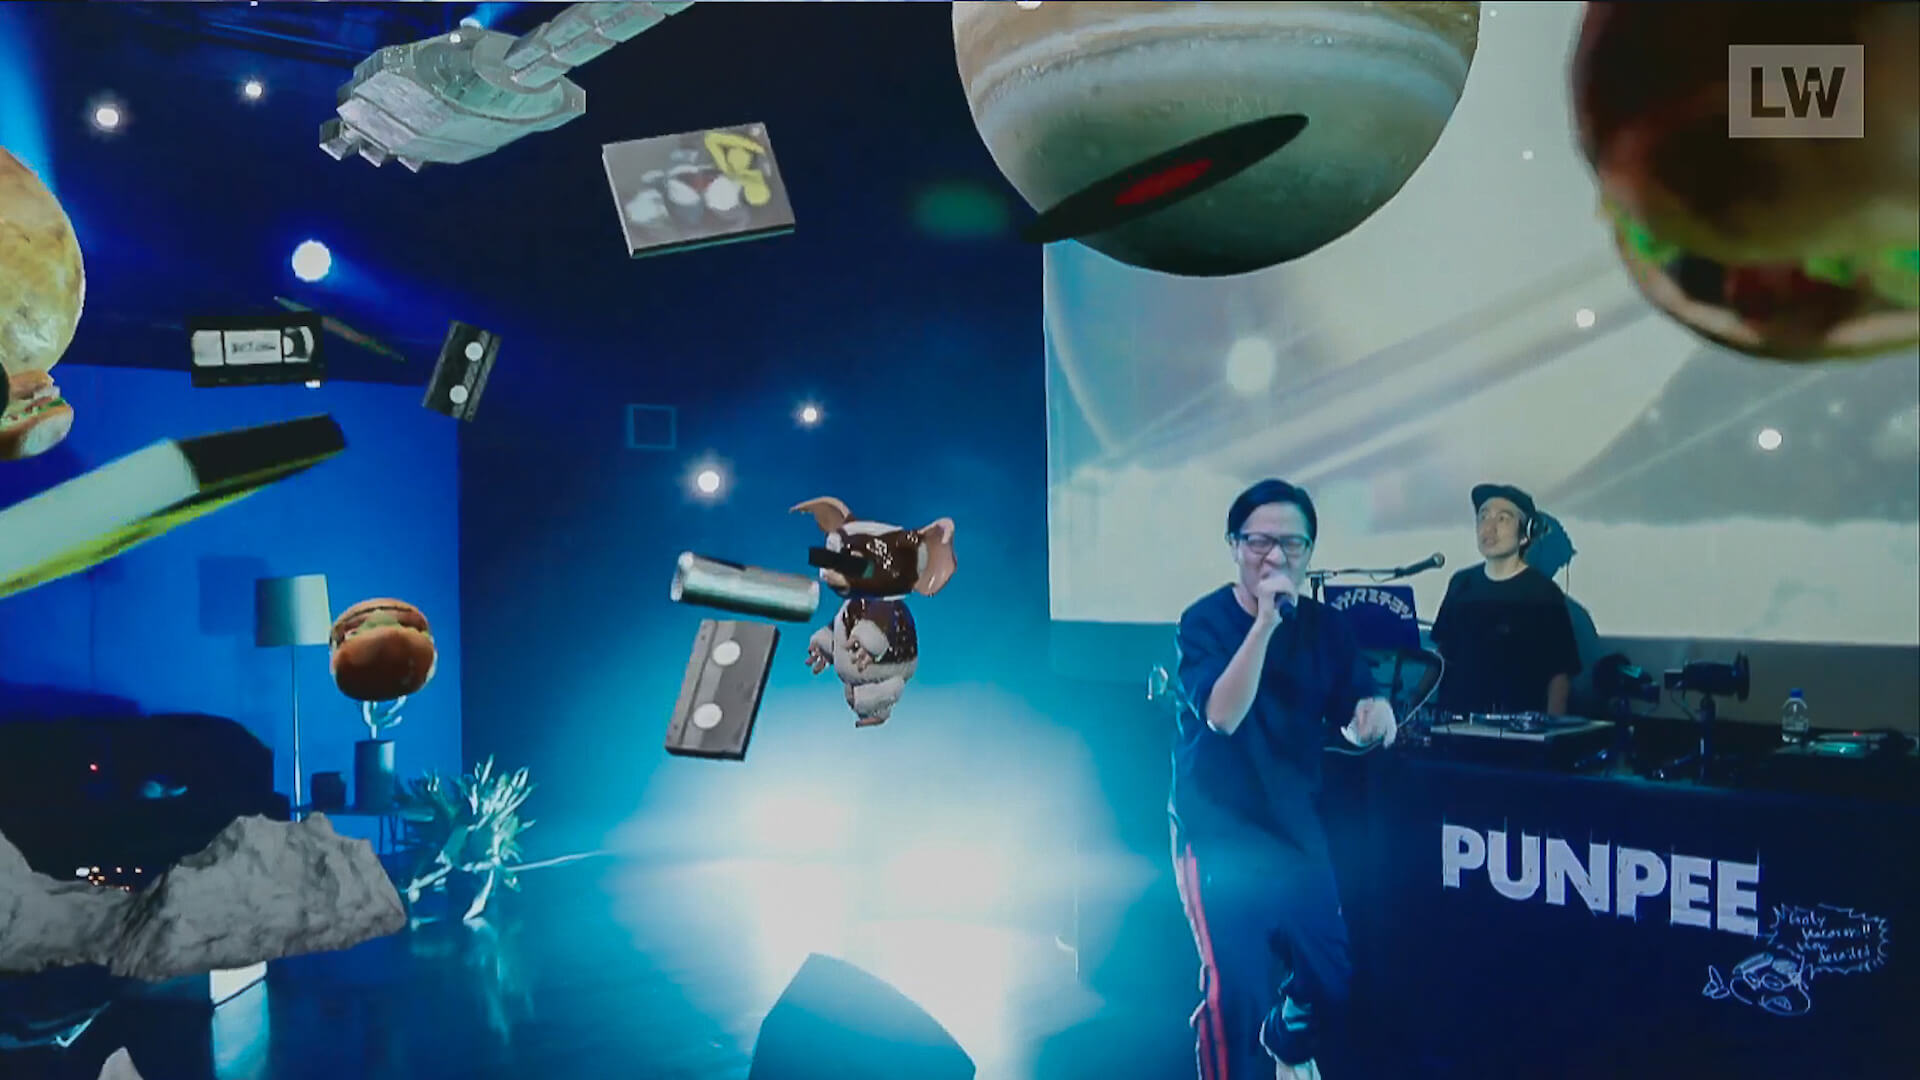 LIVEWIRE PUNPEE<Sofa Kingdomcome>のイースターエッグを一挙紹介! by みやーんZZ music200918_punpee_livewire_8